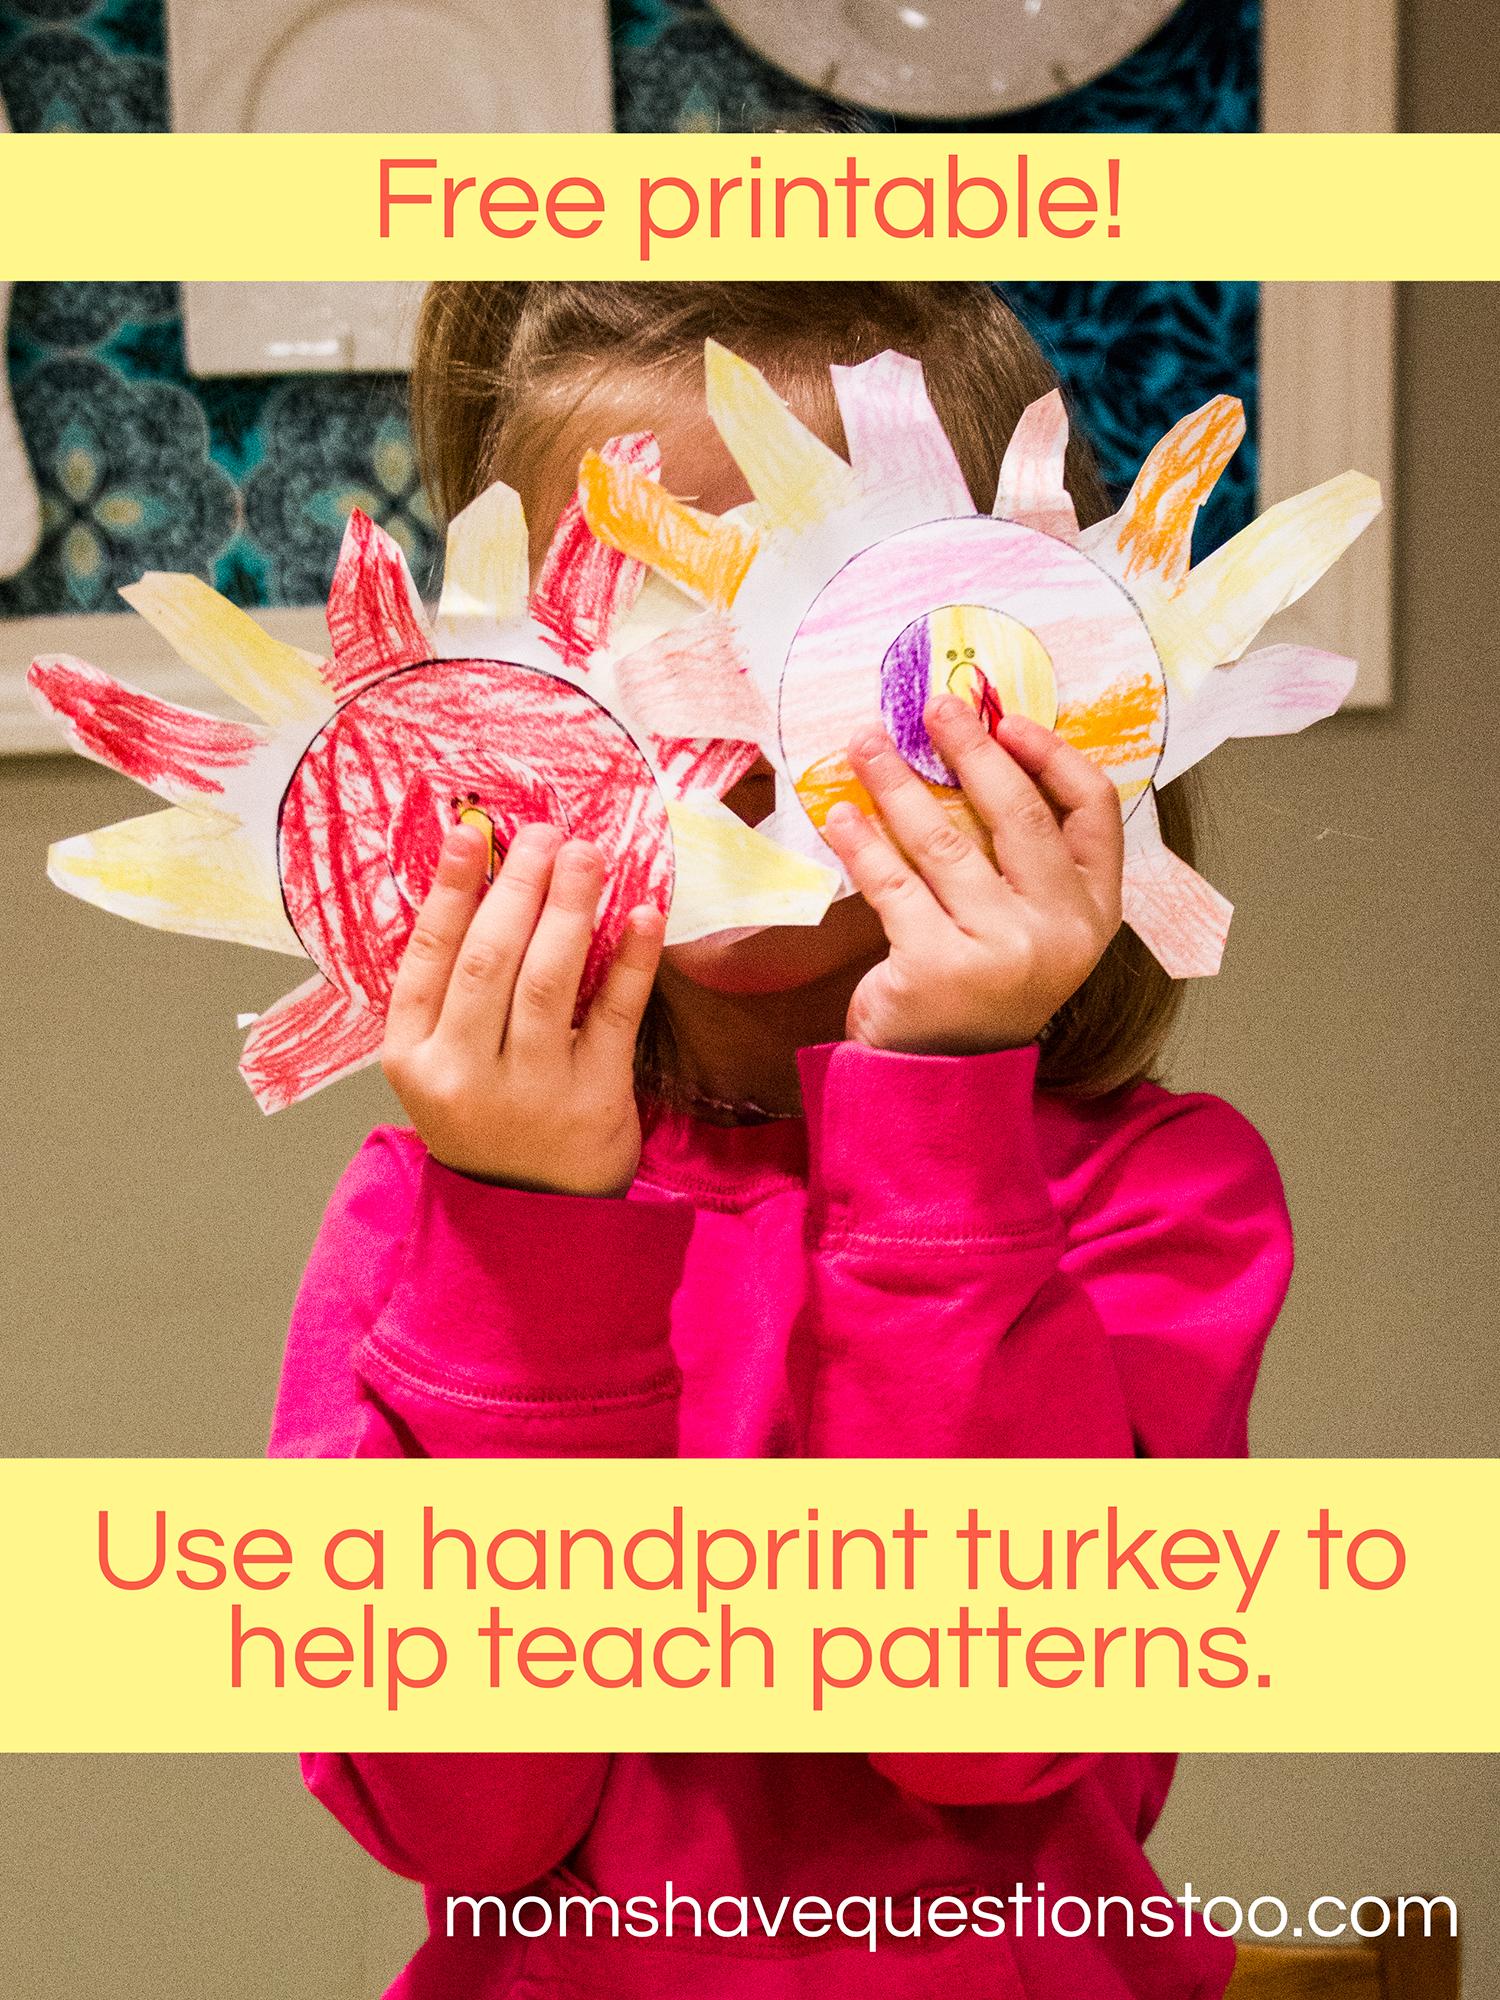 Use a Handprint Turkey to Teach Patterns!